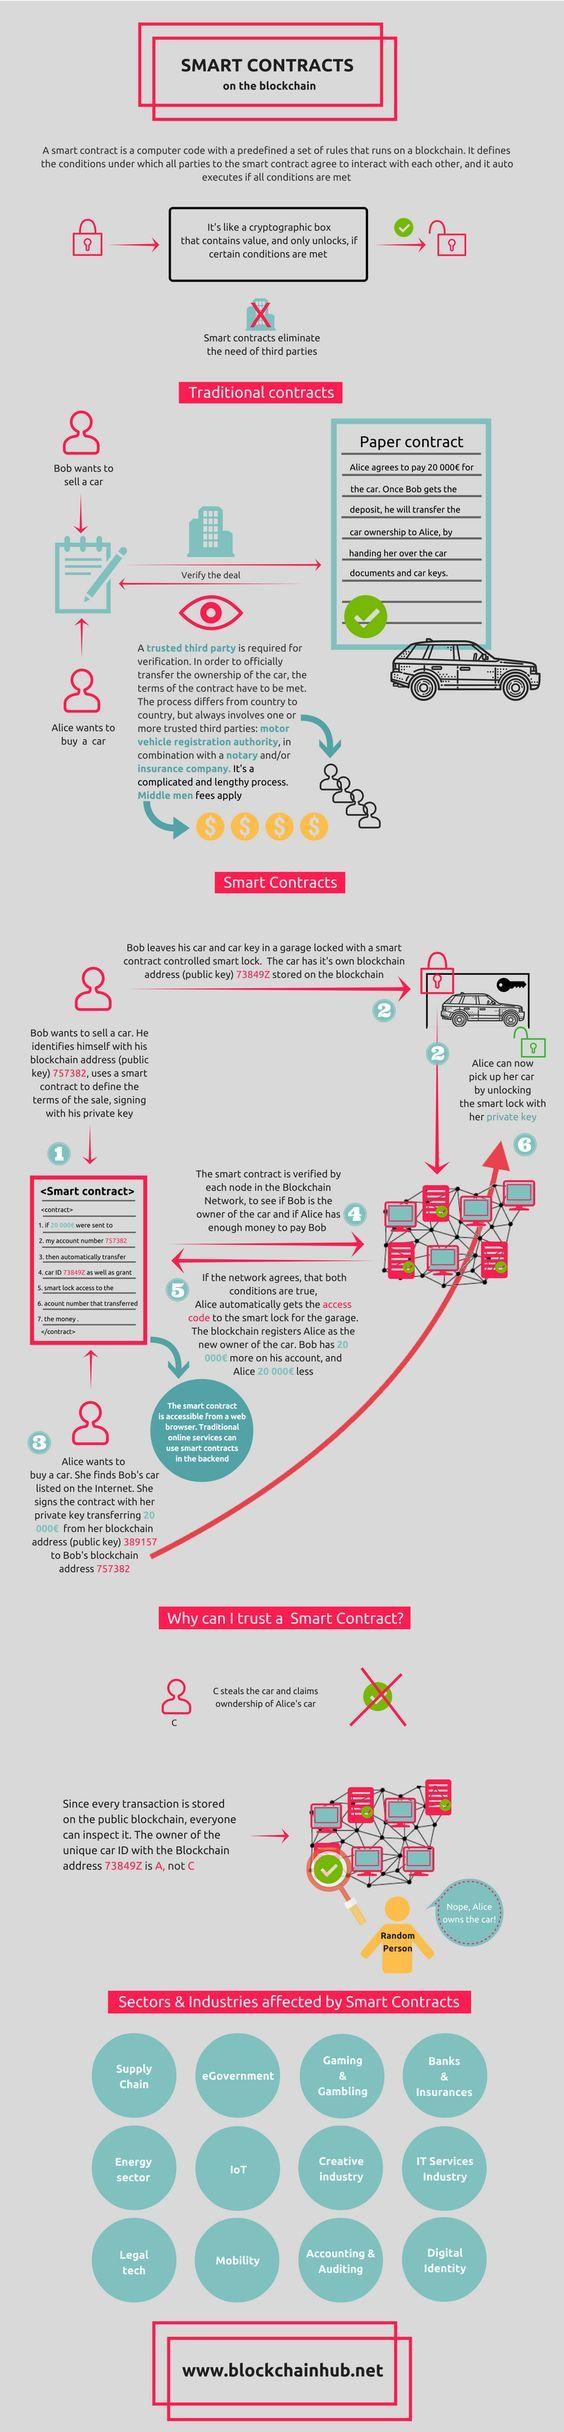 Smart contracts explained - BlockchainHub